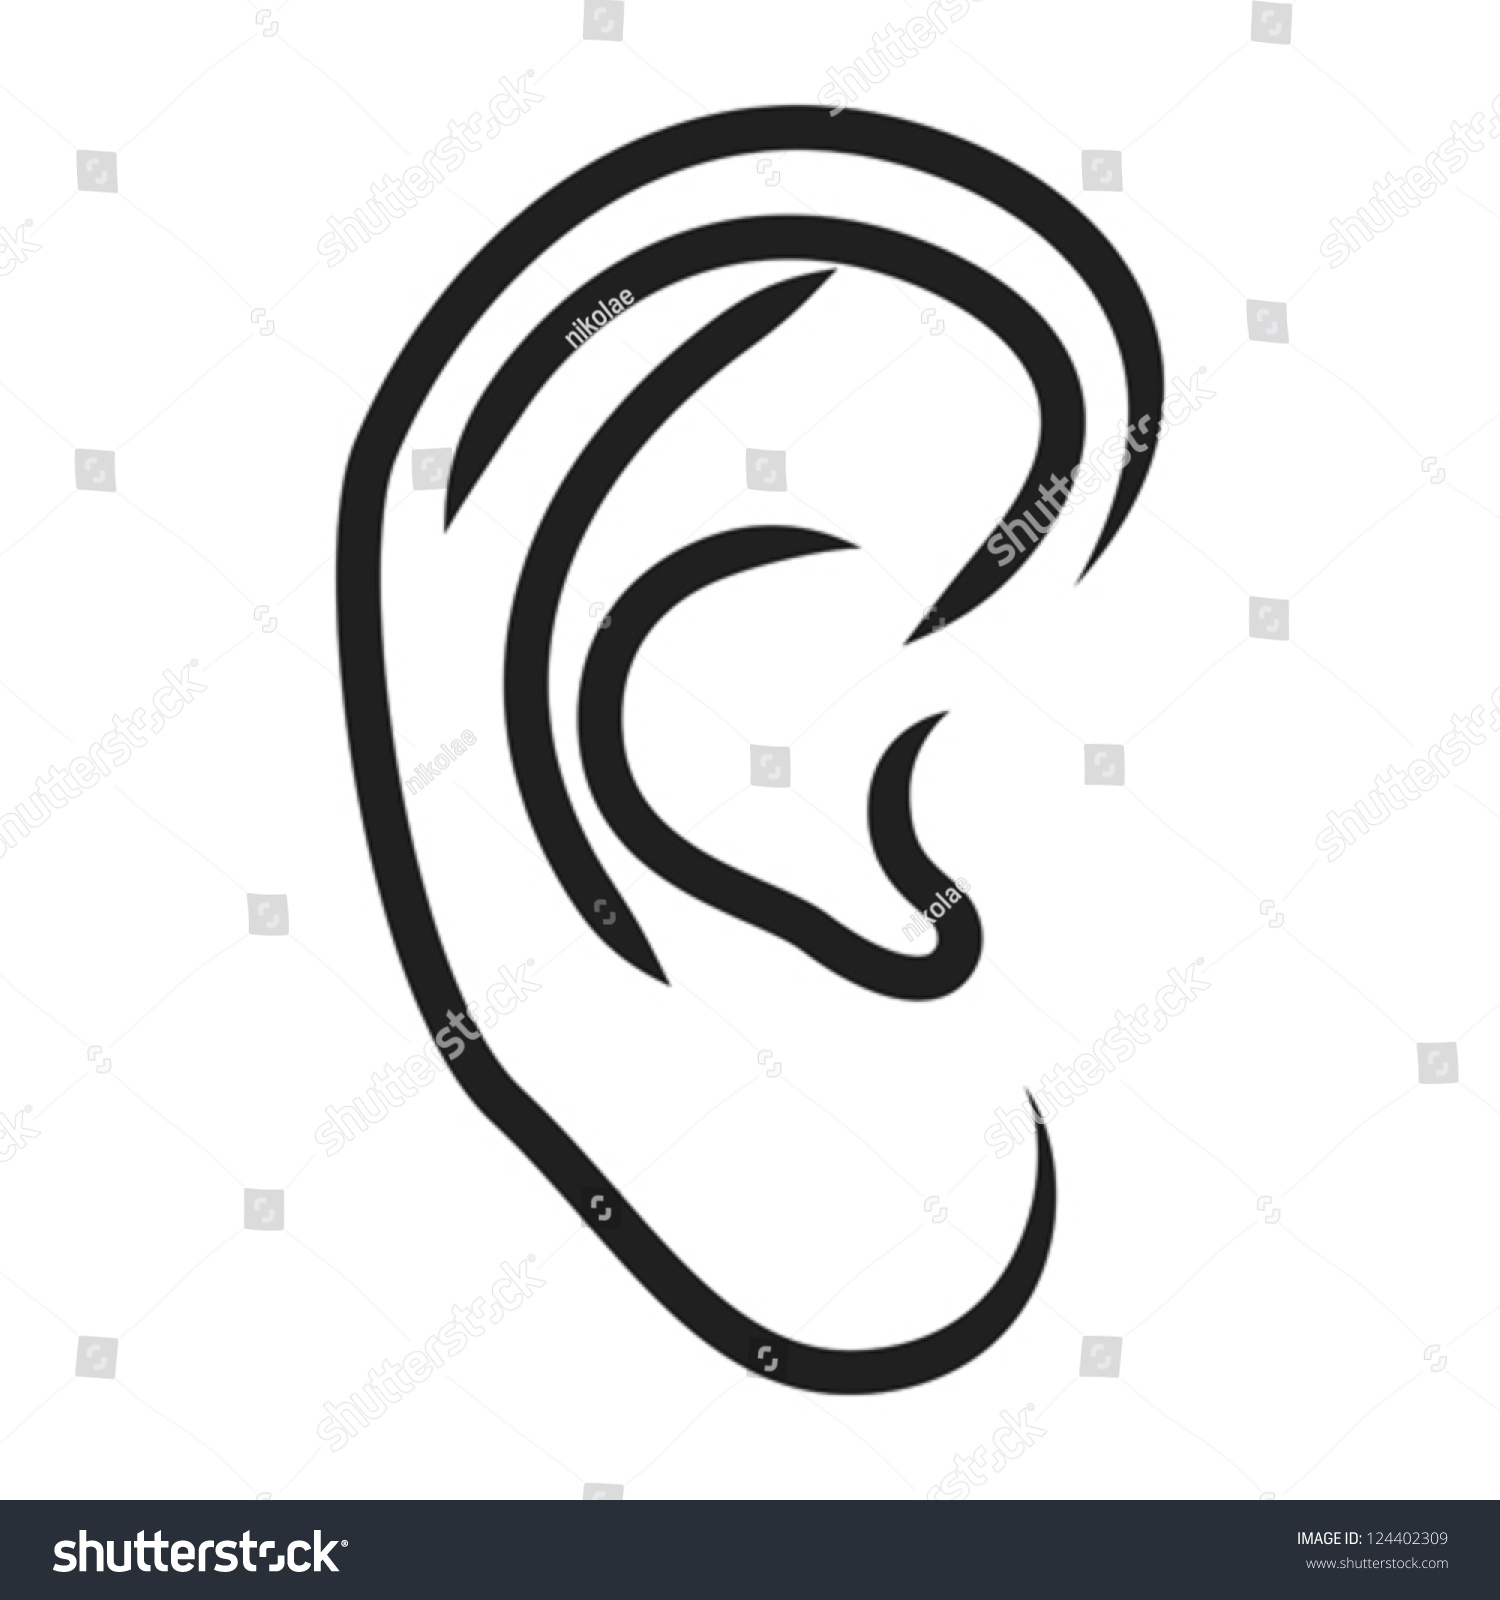 Human Ear Vector Illustration Stock Vector 124402309 ...